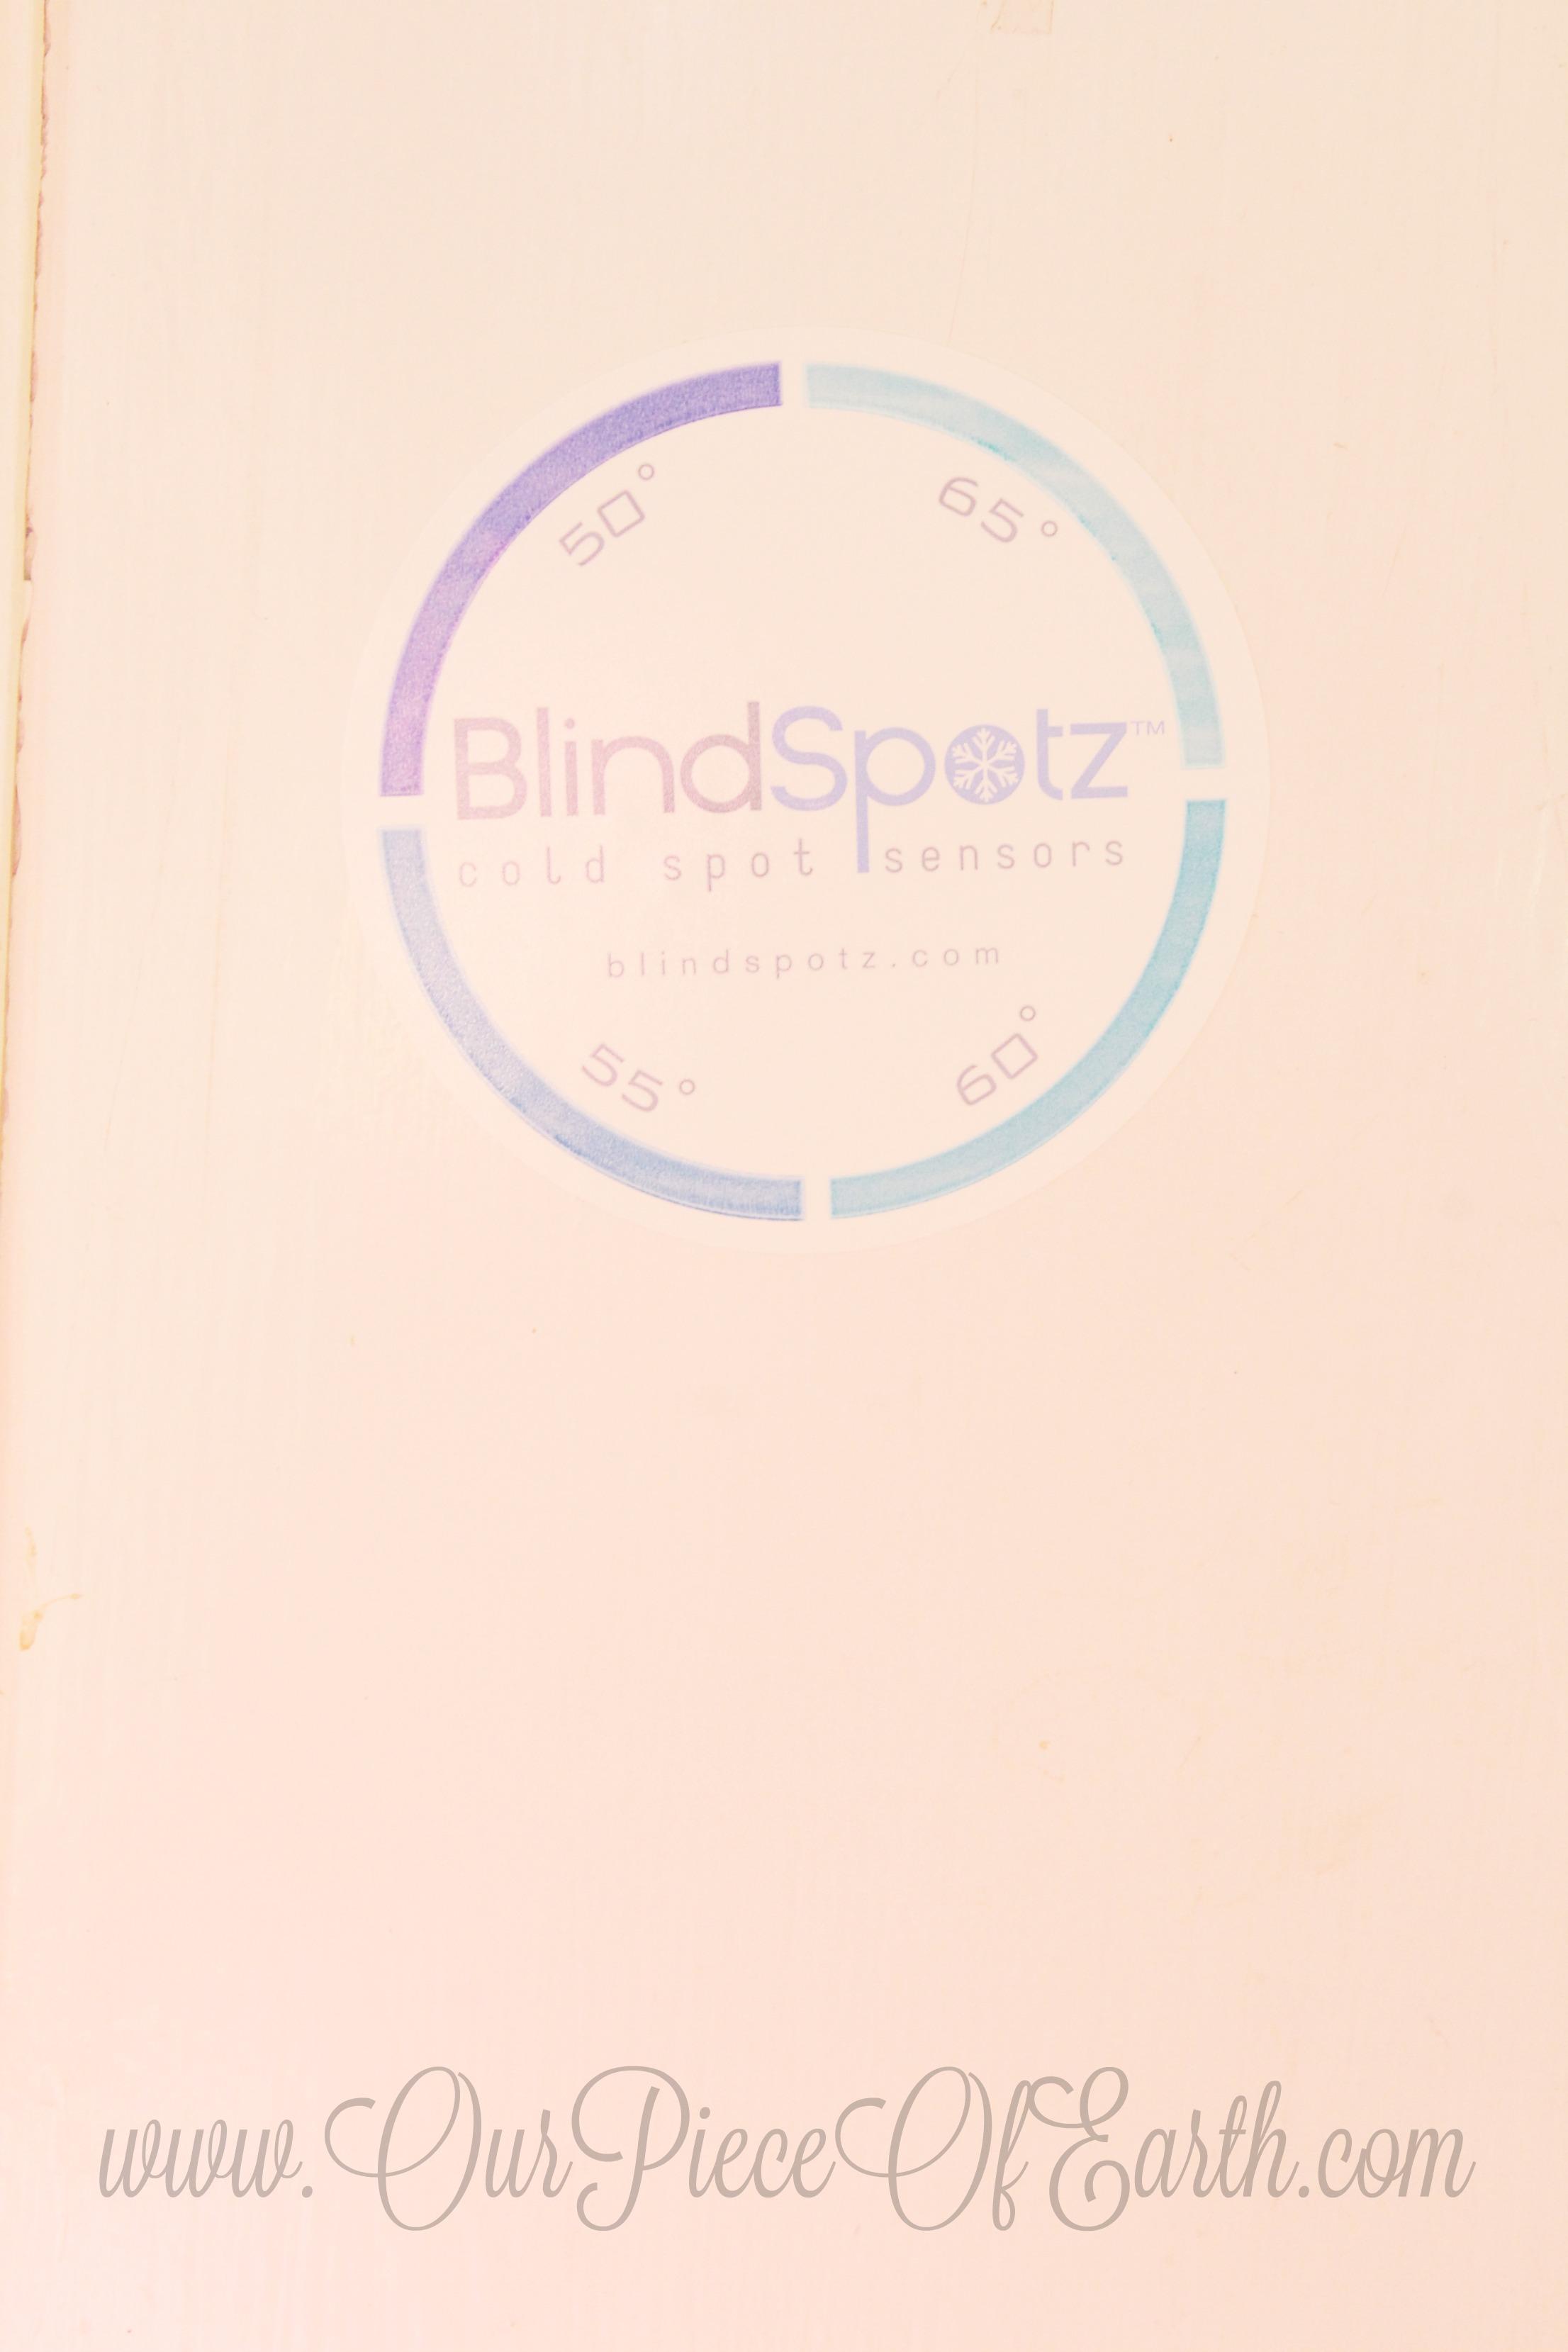 BlindSpotz lets you do a home energy efficiency audit.